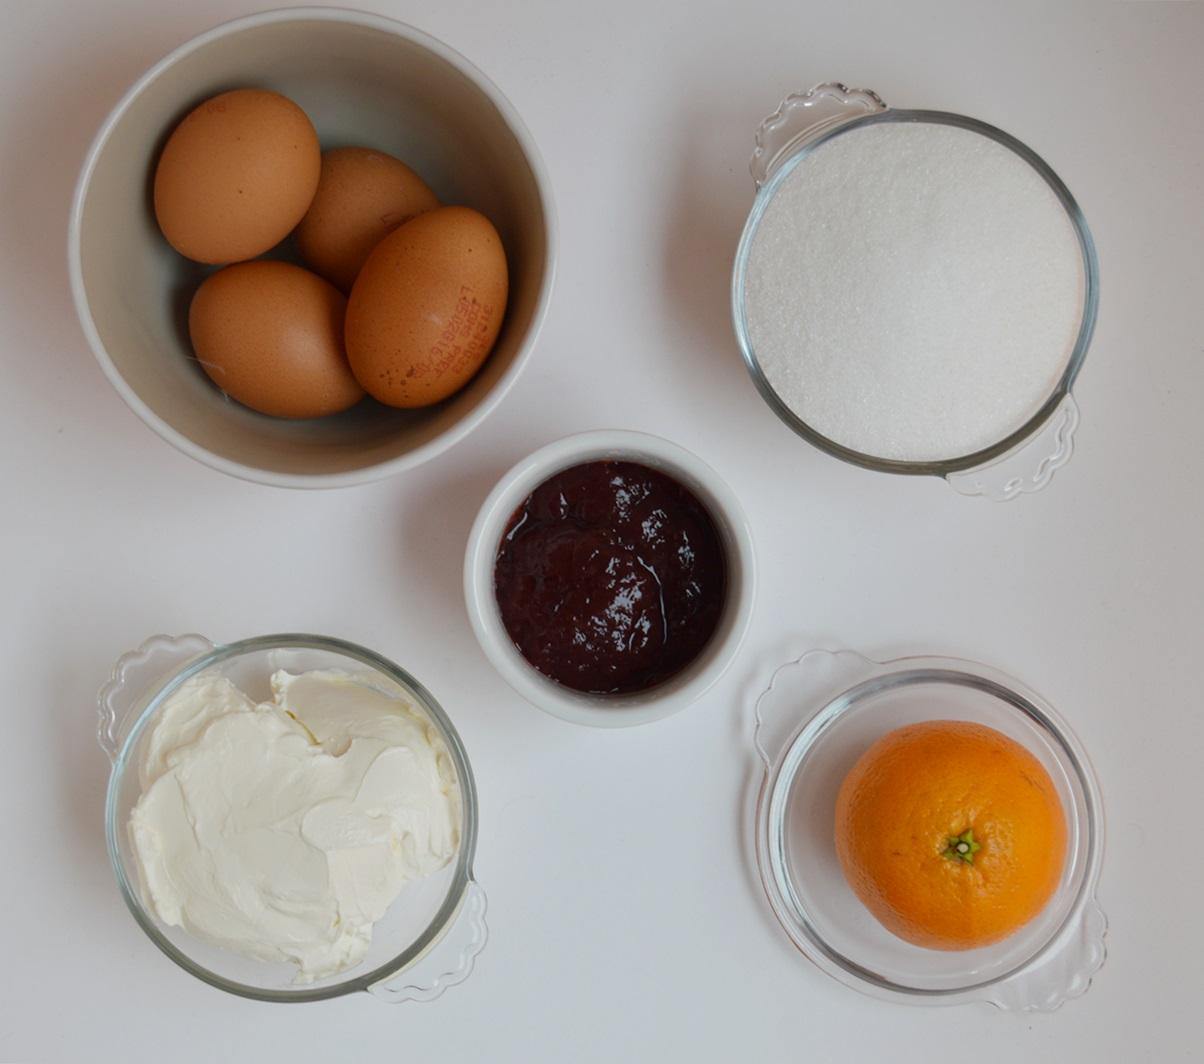 Ingredientes cheesecake de naranja con cobertura de frambuesa. Aroma de chocolate